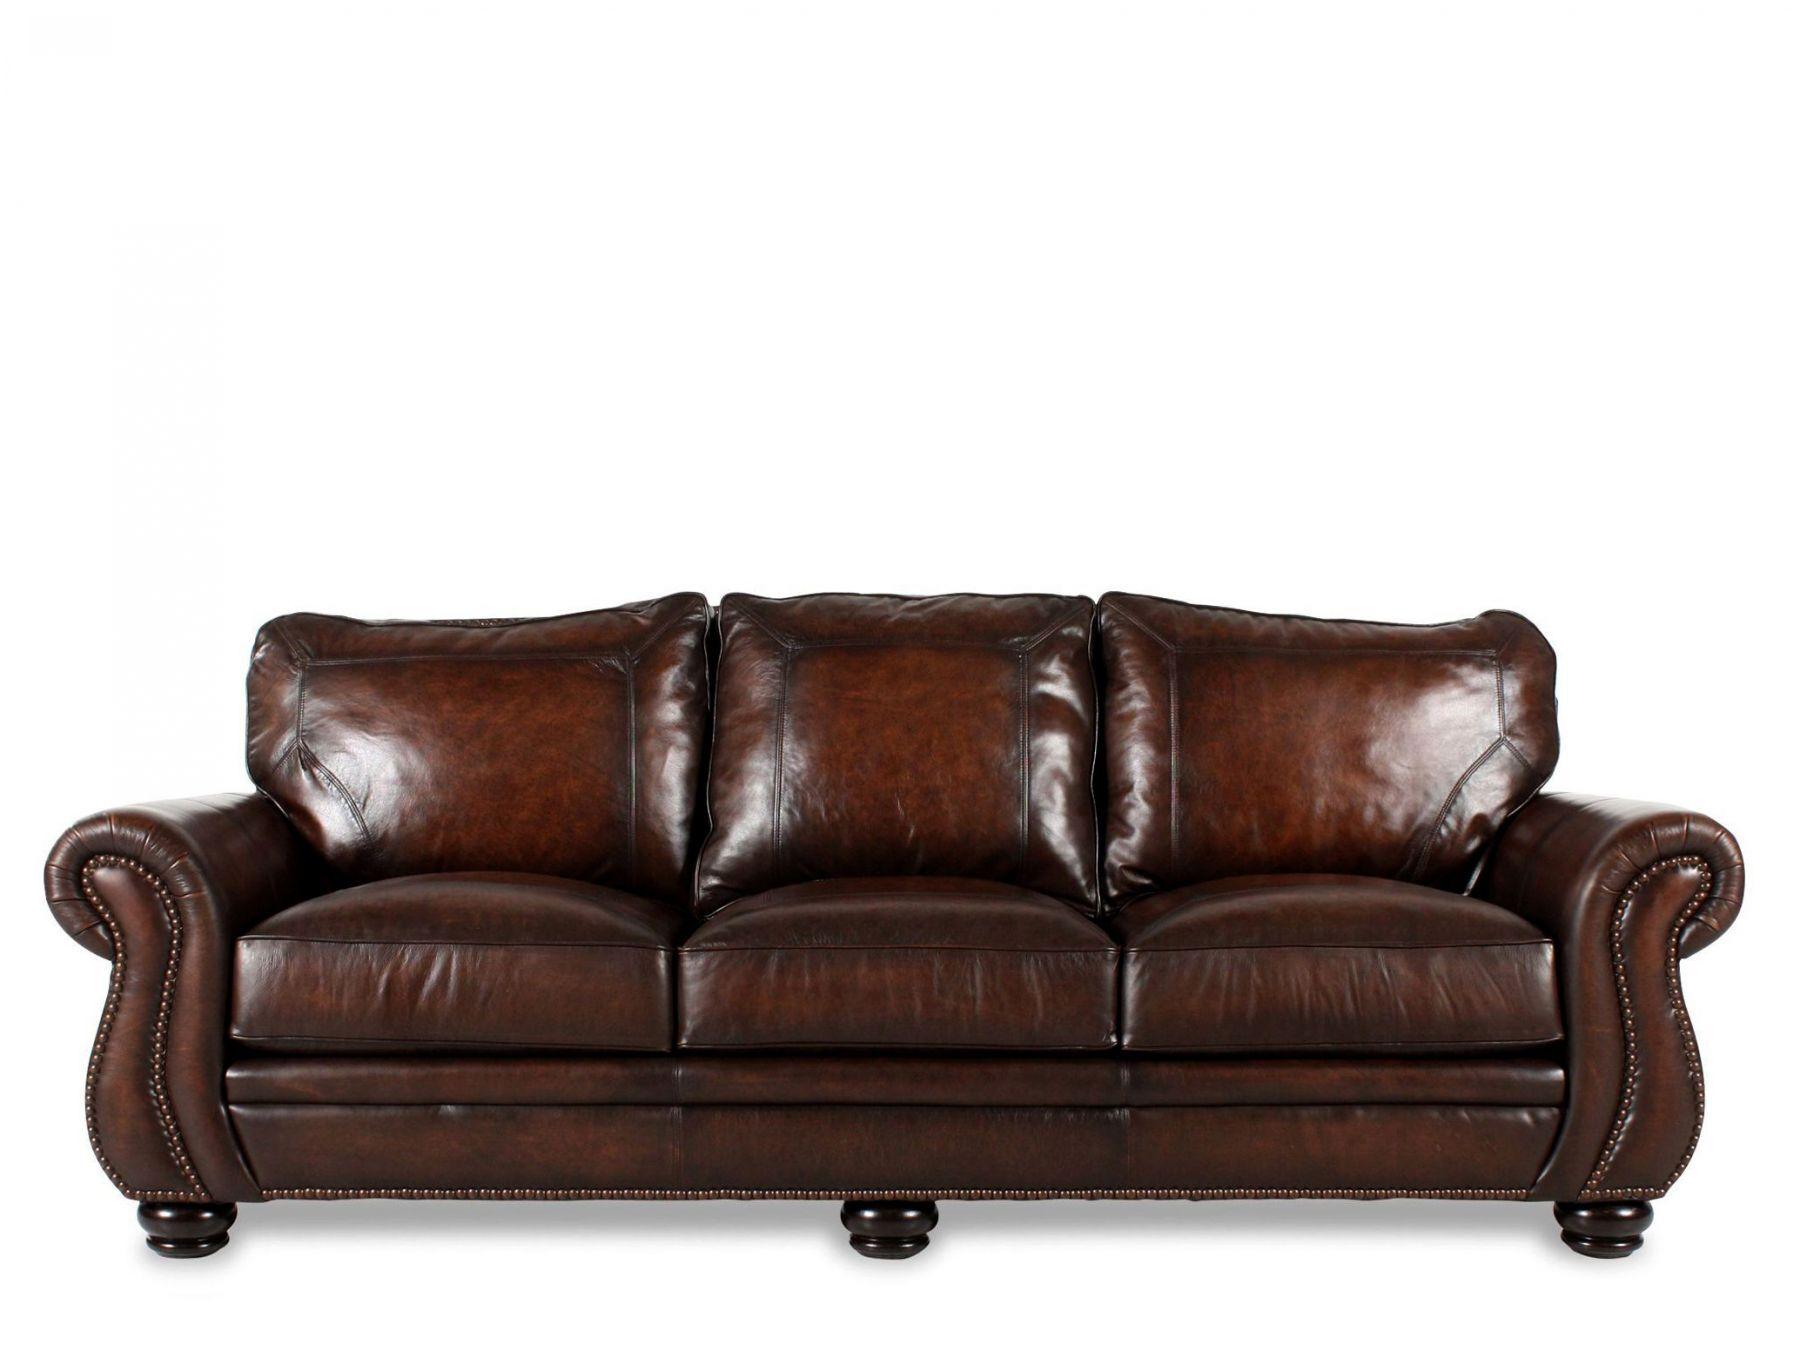 bernhardt breckenridge sofa chesterfield antique leather mathis brothers